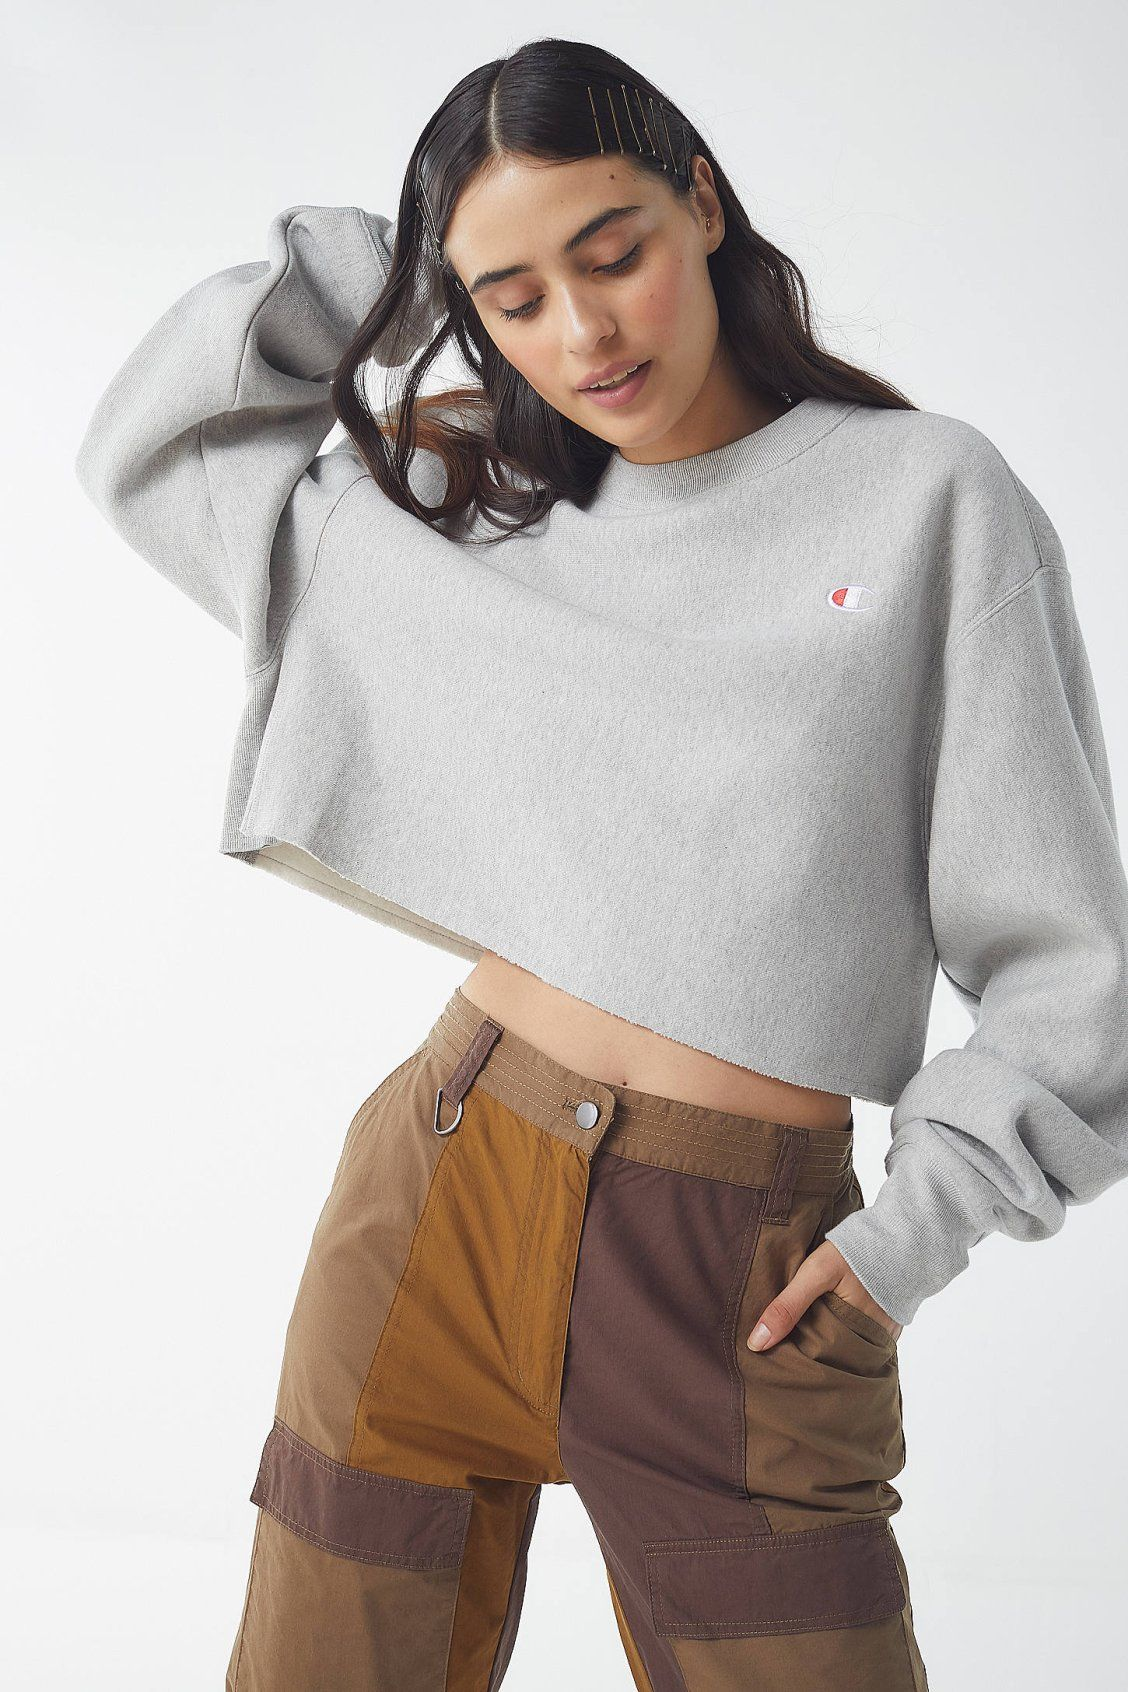 Champion Crew Neck Cropped Sweatshirt Crop Sweatshirt Pullovers Outfit Champion Clothing [ 1692 x 1128 Pixel ]